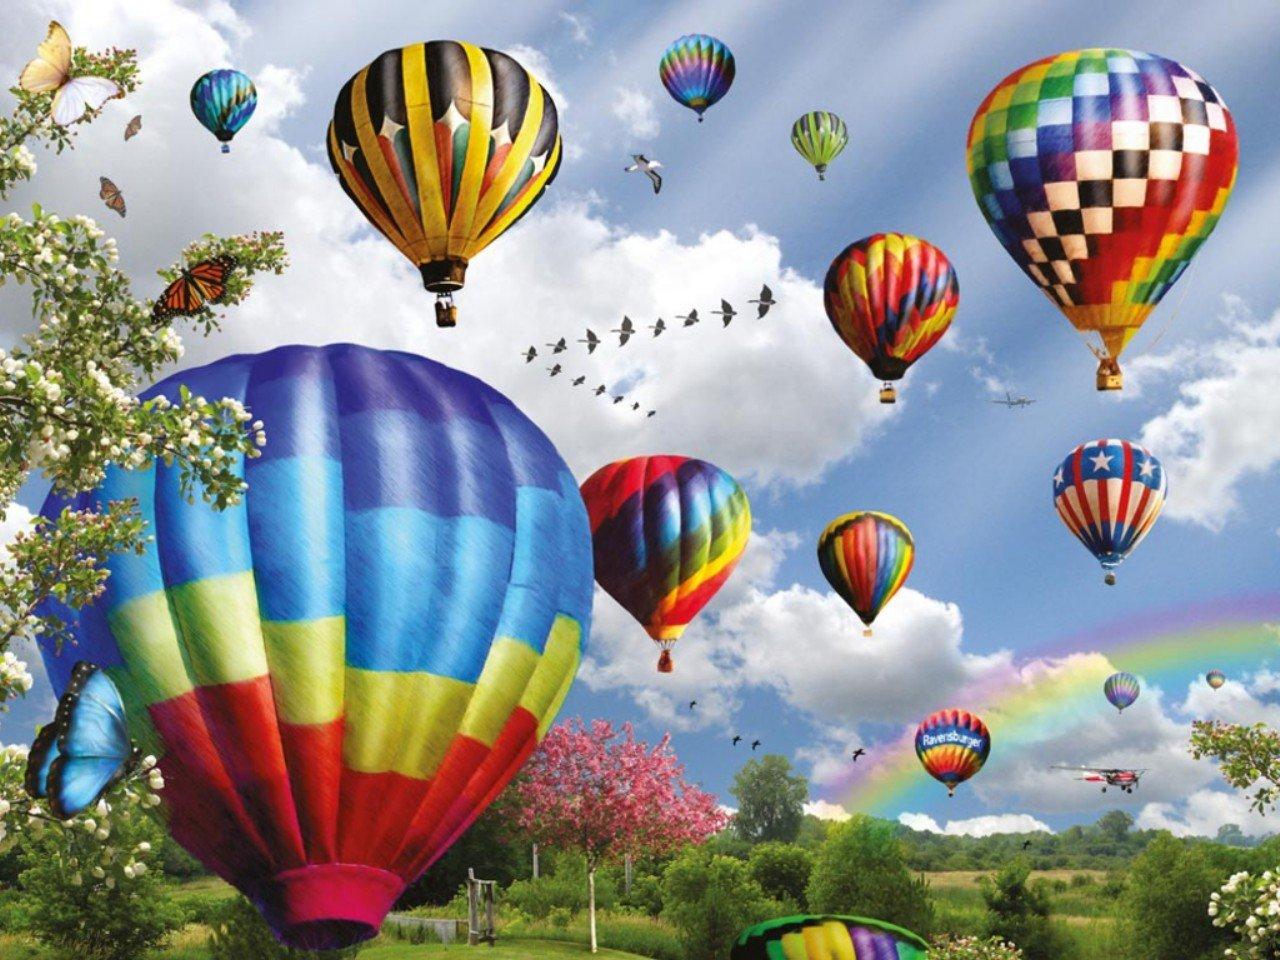 Air Balloons Computer Wallpapers Desktop Backgrounds 1280x960 ID 1280x960